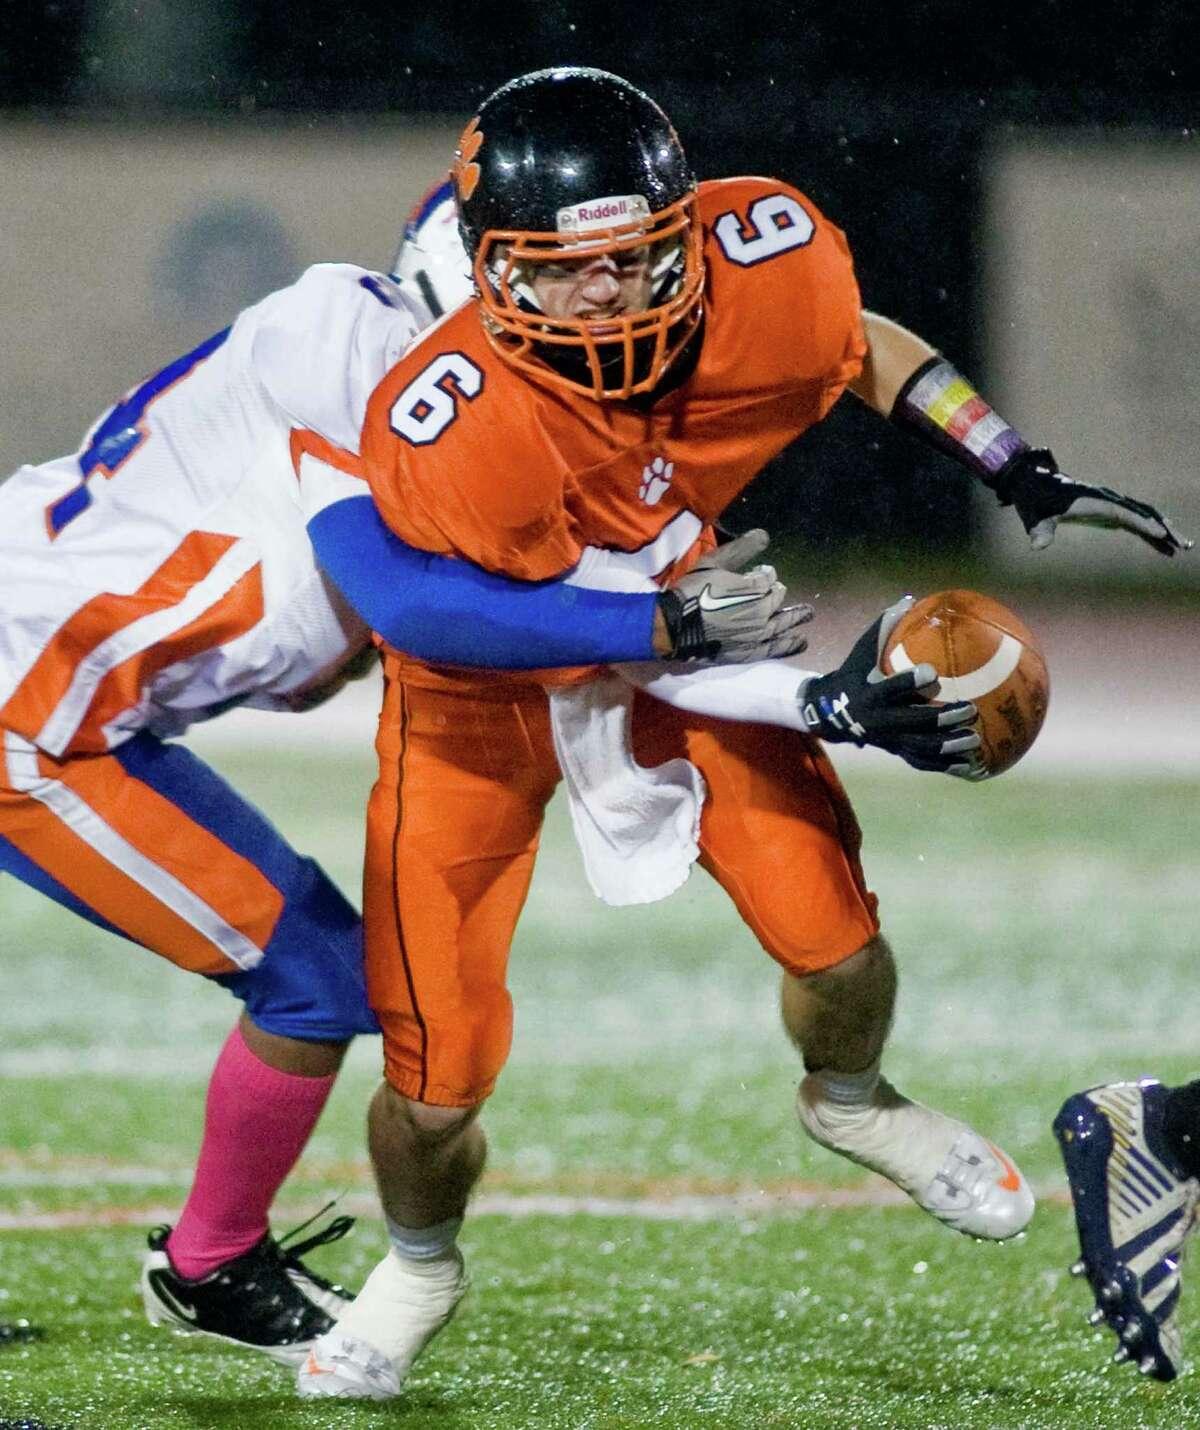 Ridgefield High School quarterback Ryan Dunn tries to break a tackle in a game against Danbury High School, played at Ridgefield. Wednesday, Nov. 27, 2013